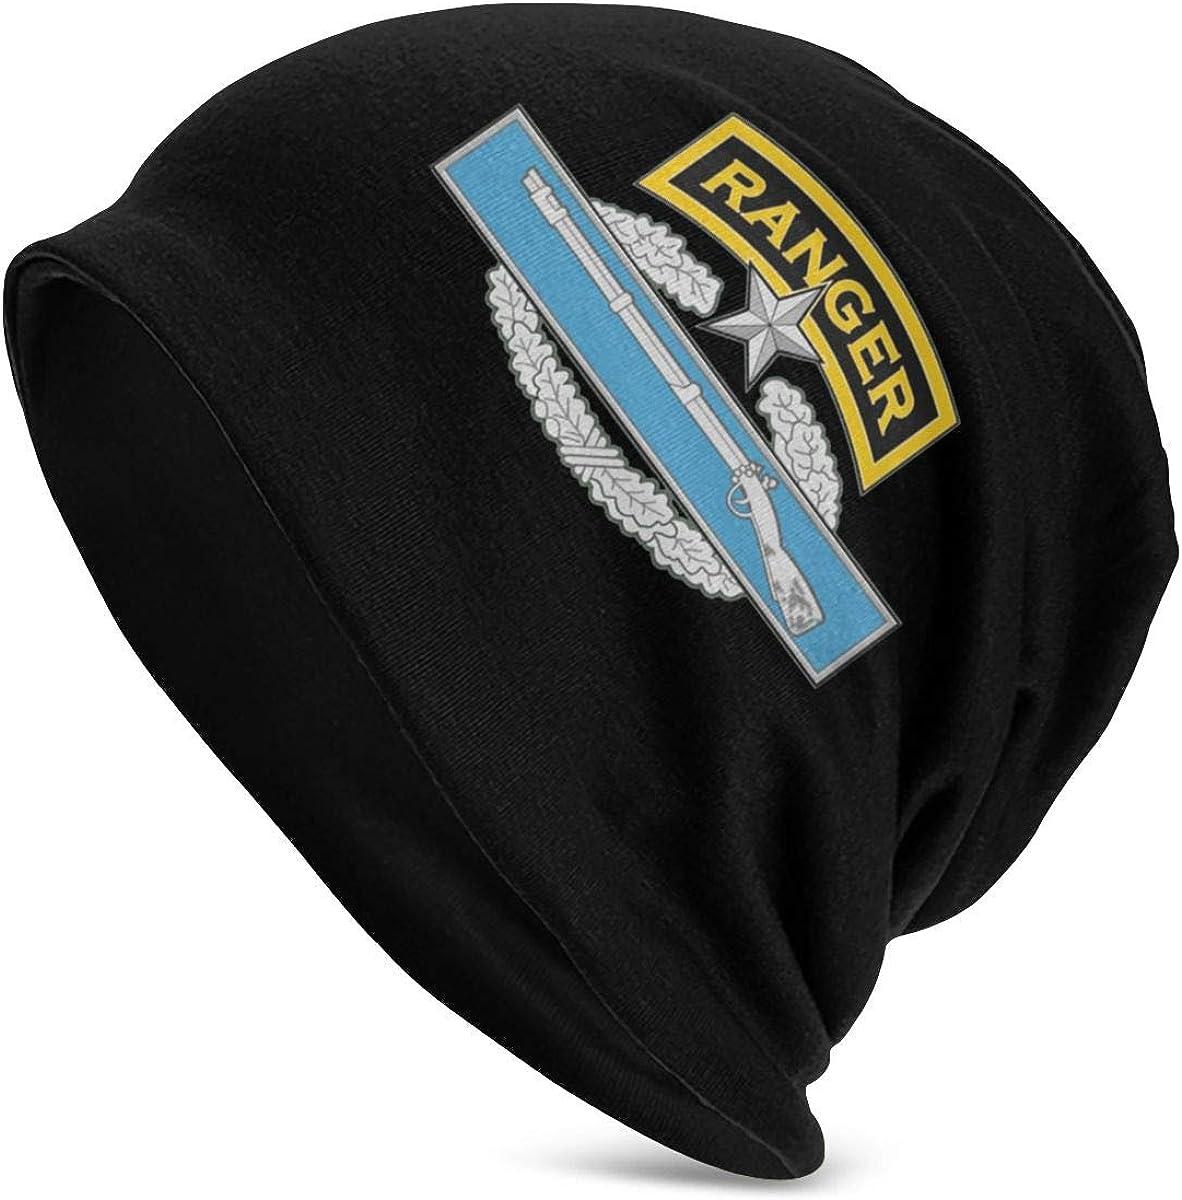 Vietnam 1st Field Force E 20 Inf with CIB Unisex Warm Hat Knit Hat Skull Cap Beanies Cap